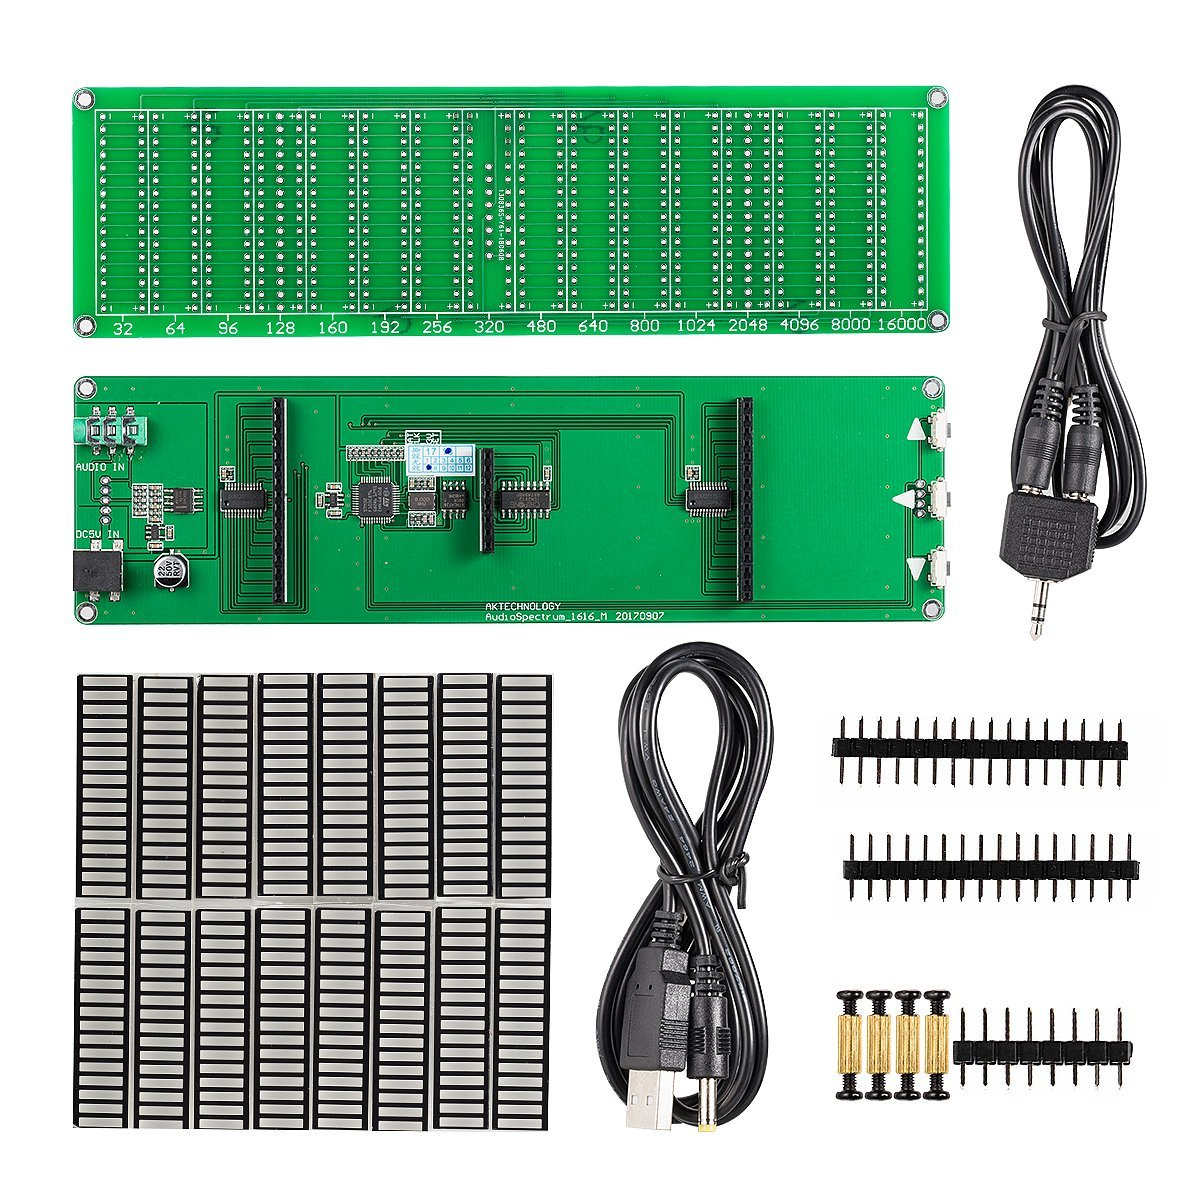 Nobsound 1616 Led Audio Spectrum Level Indicator Vu Meters Music Meter Product Details